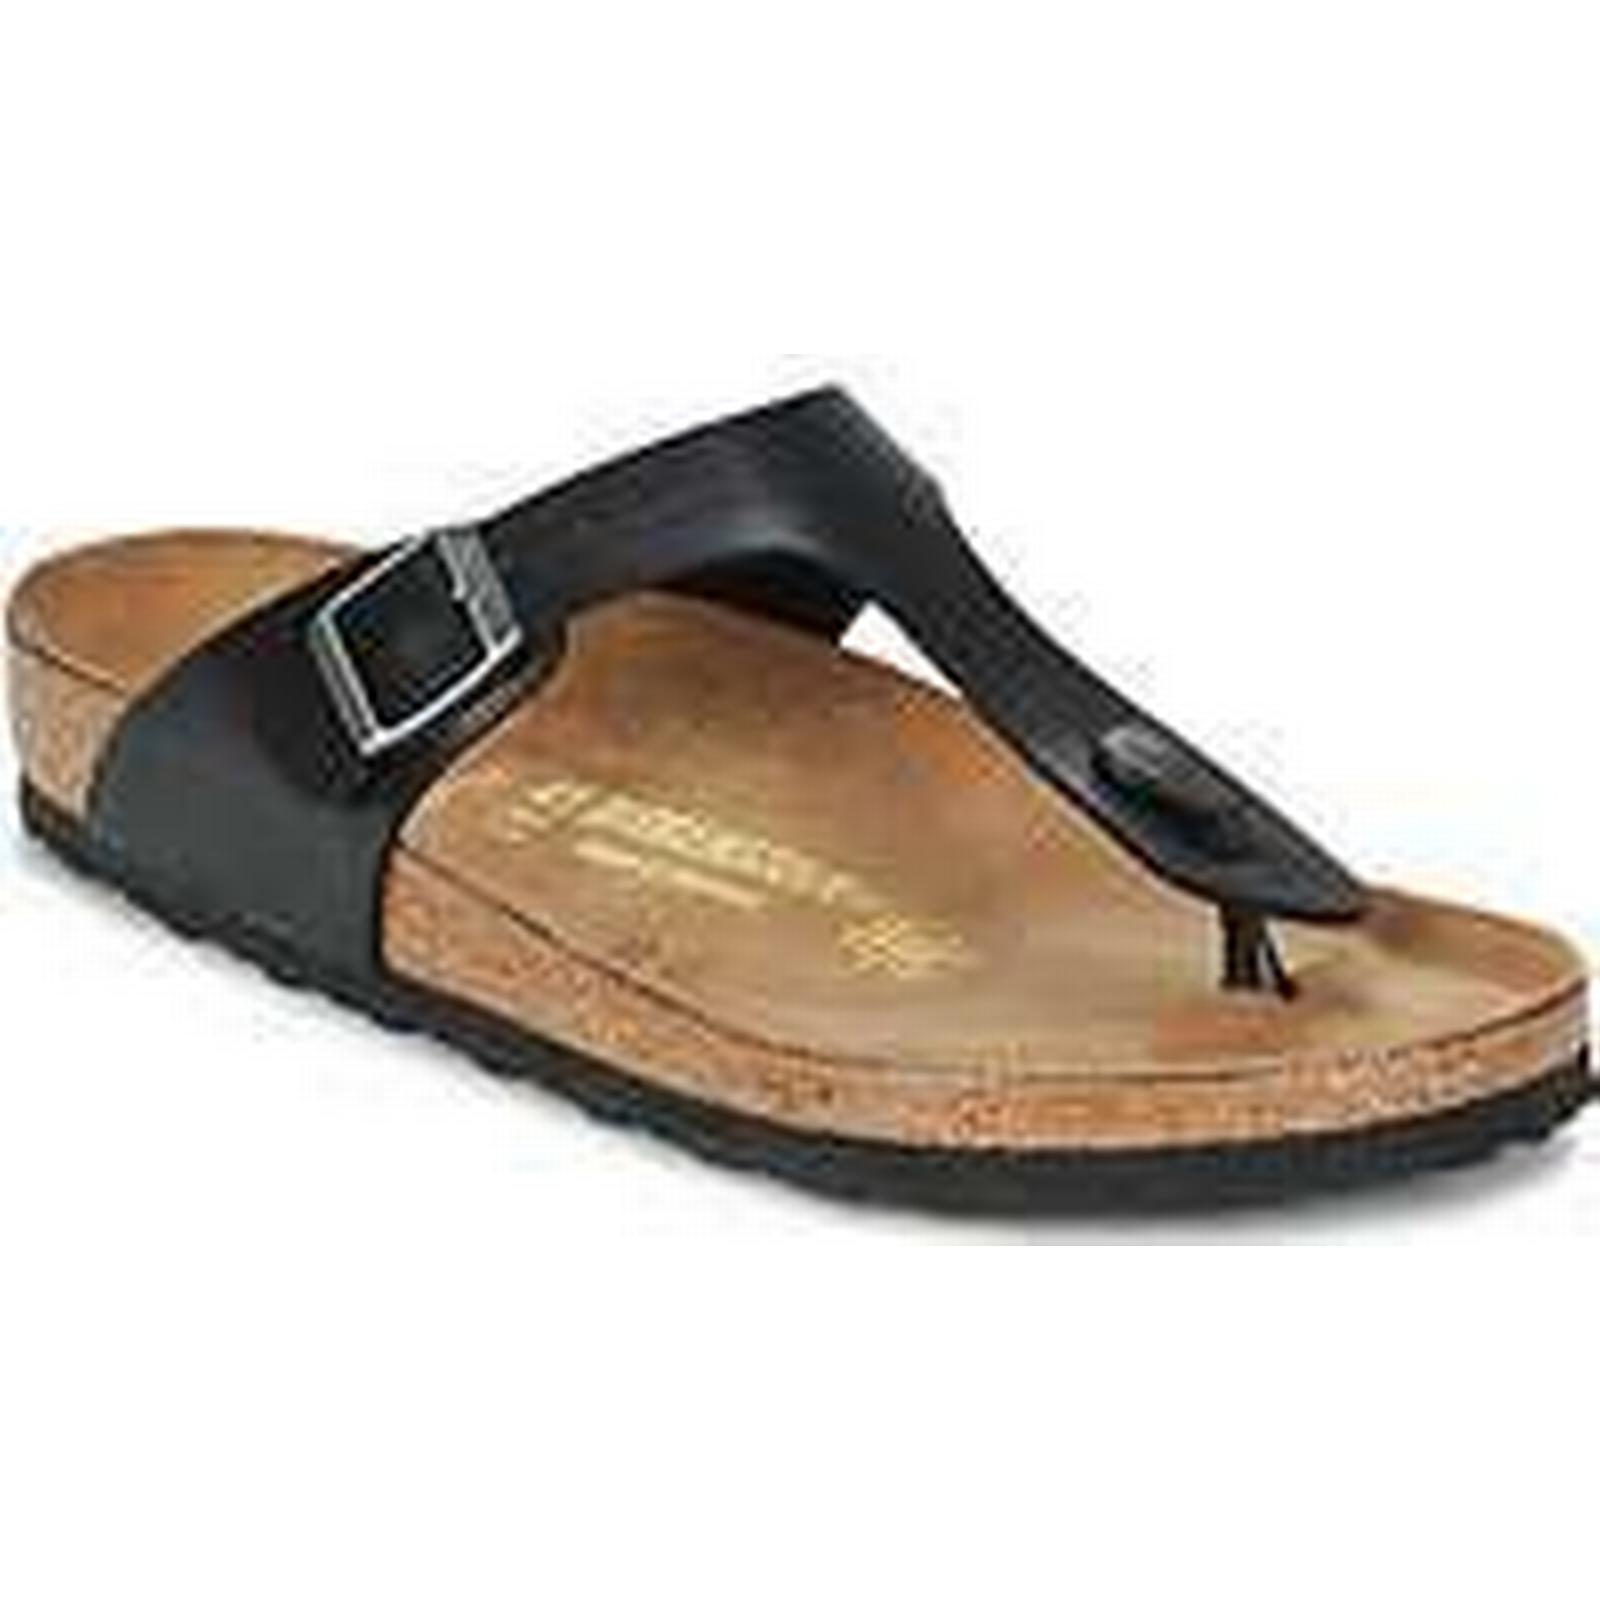 Spartoo.co.uk / Birkenstock GIZEH women's Flip flops / Spartoo.co.uk Sandals (Shoes) in Black fea93e